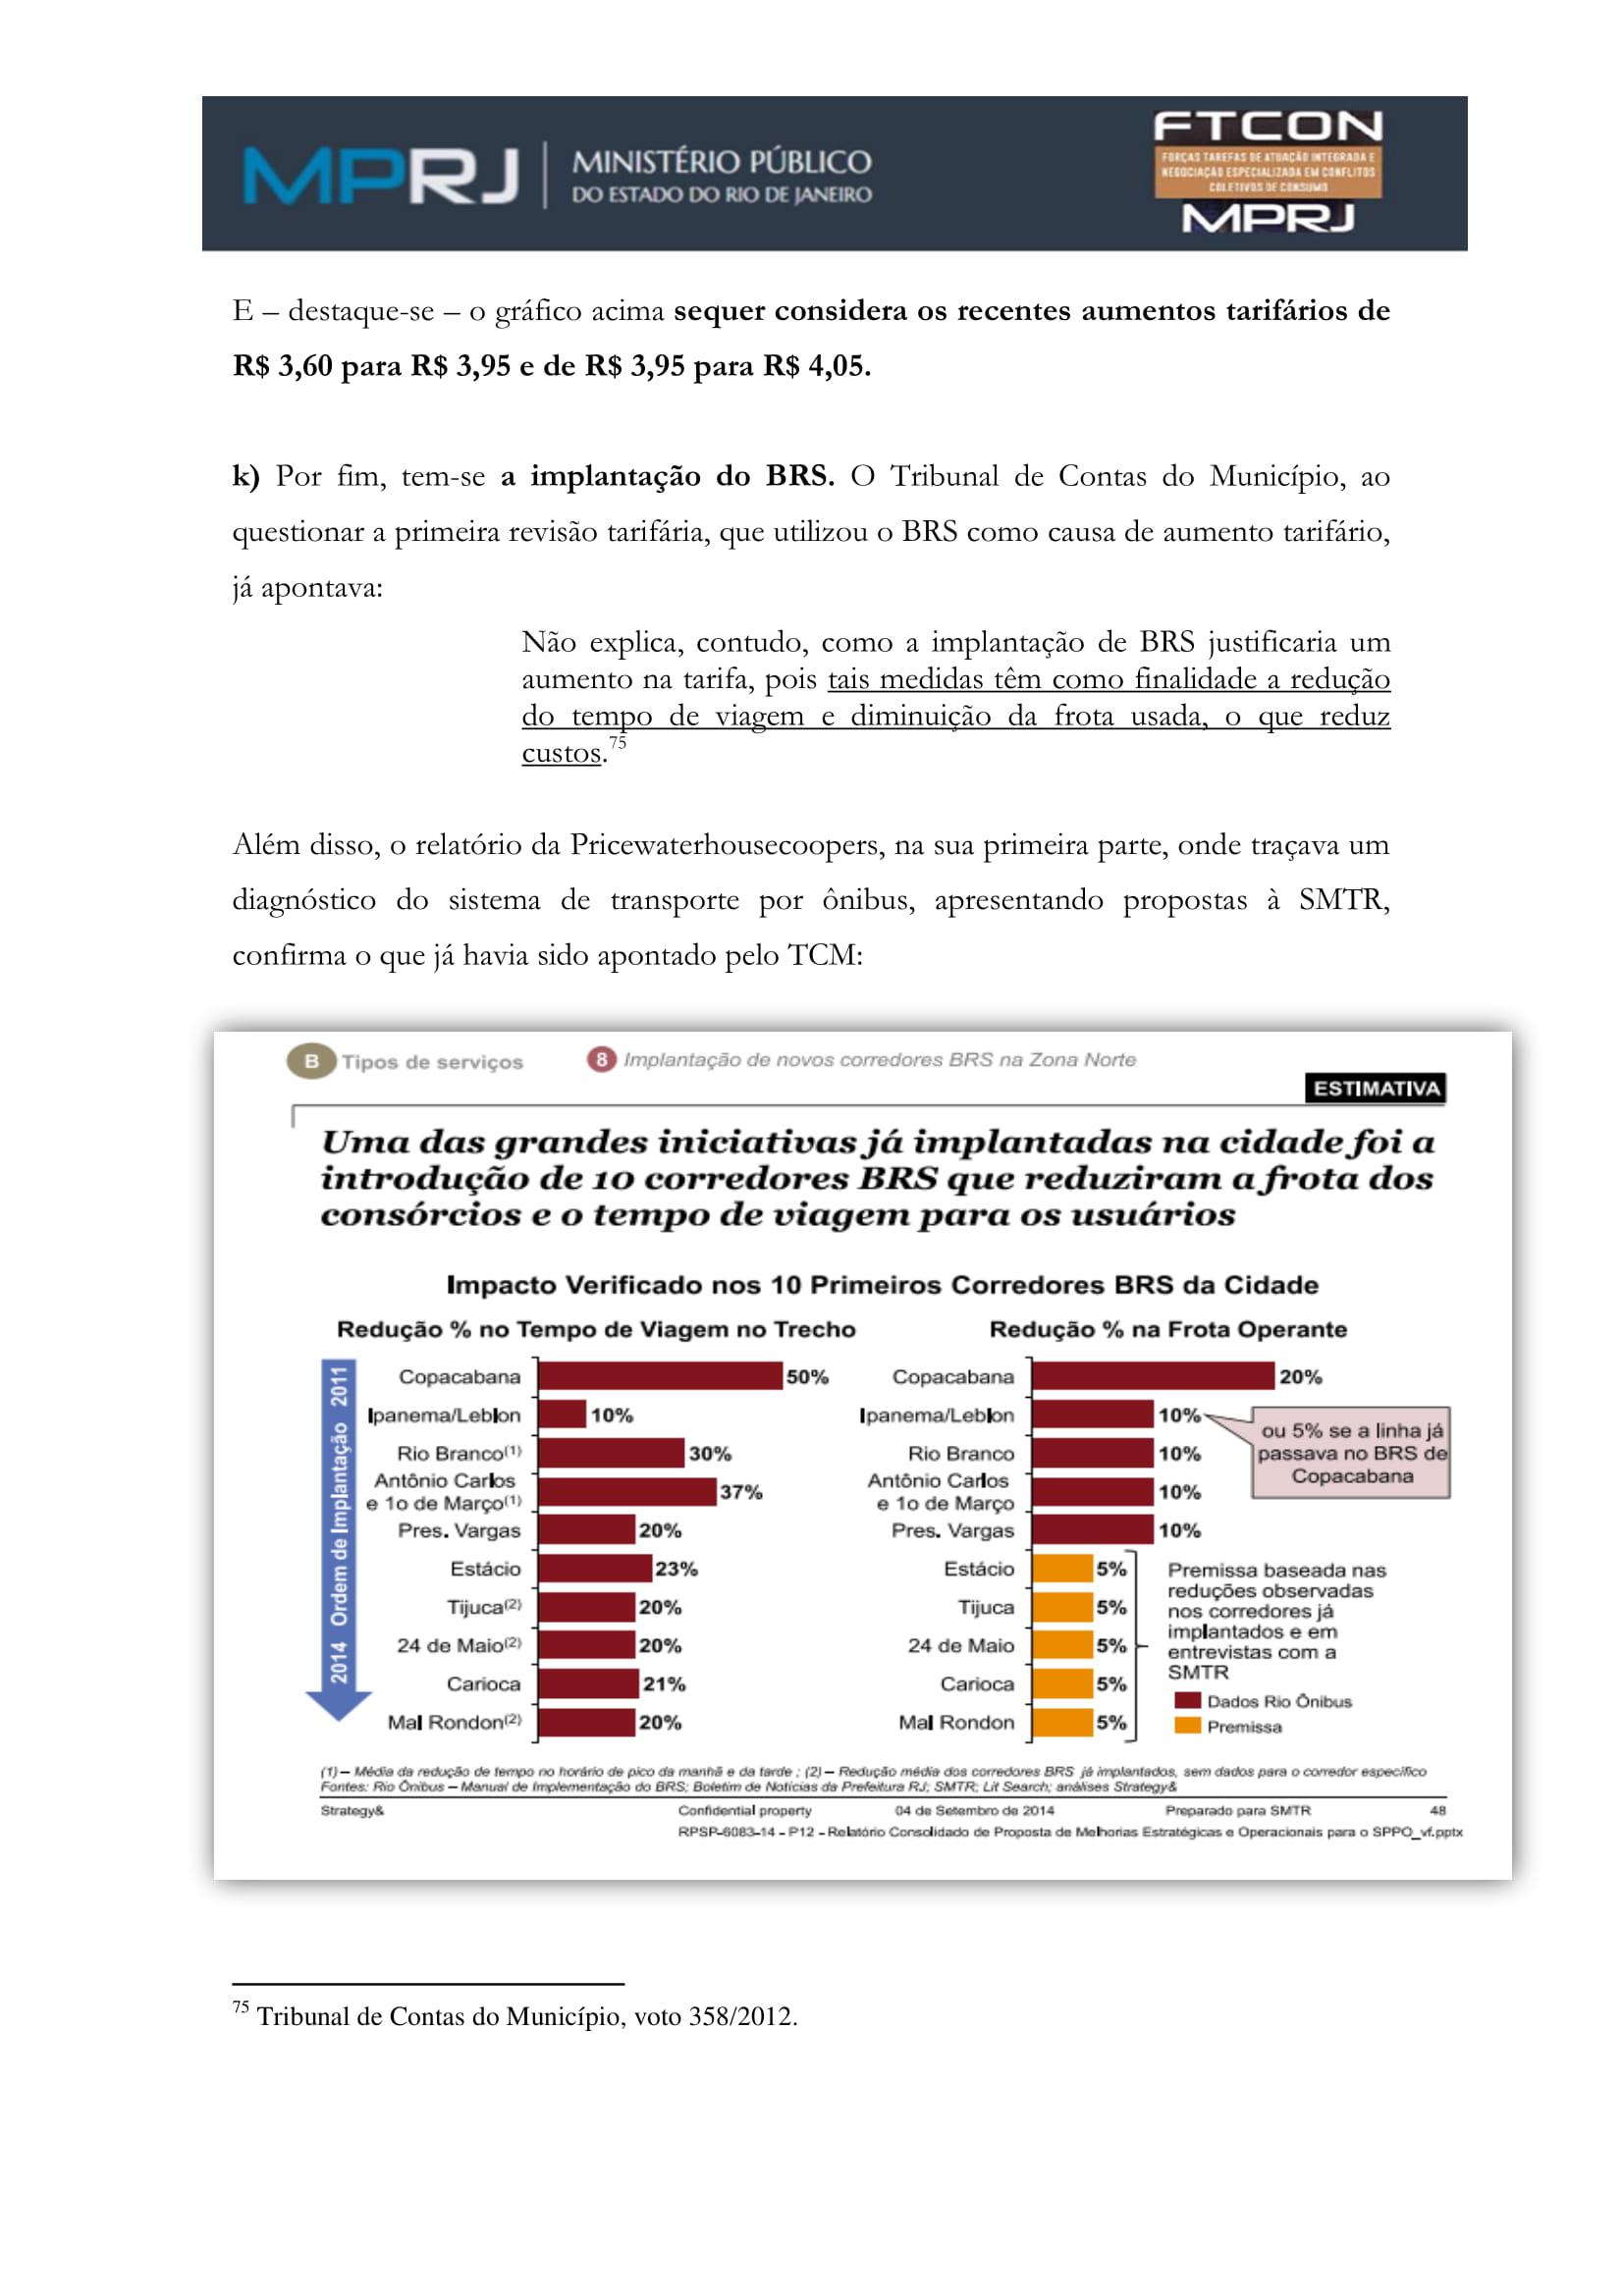 acp_caducidade_onibus_dr_rt-084